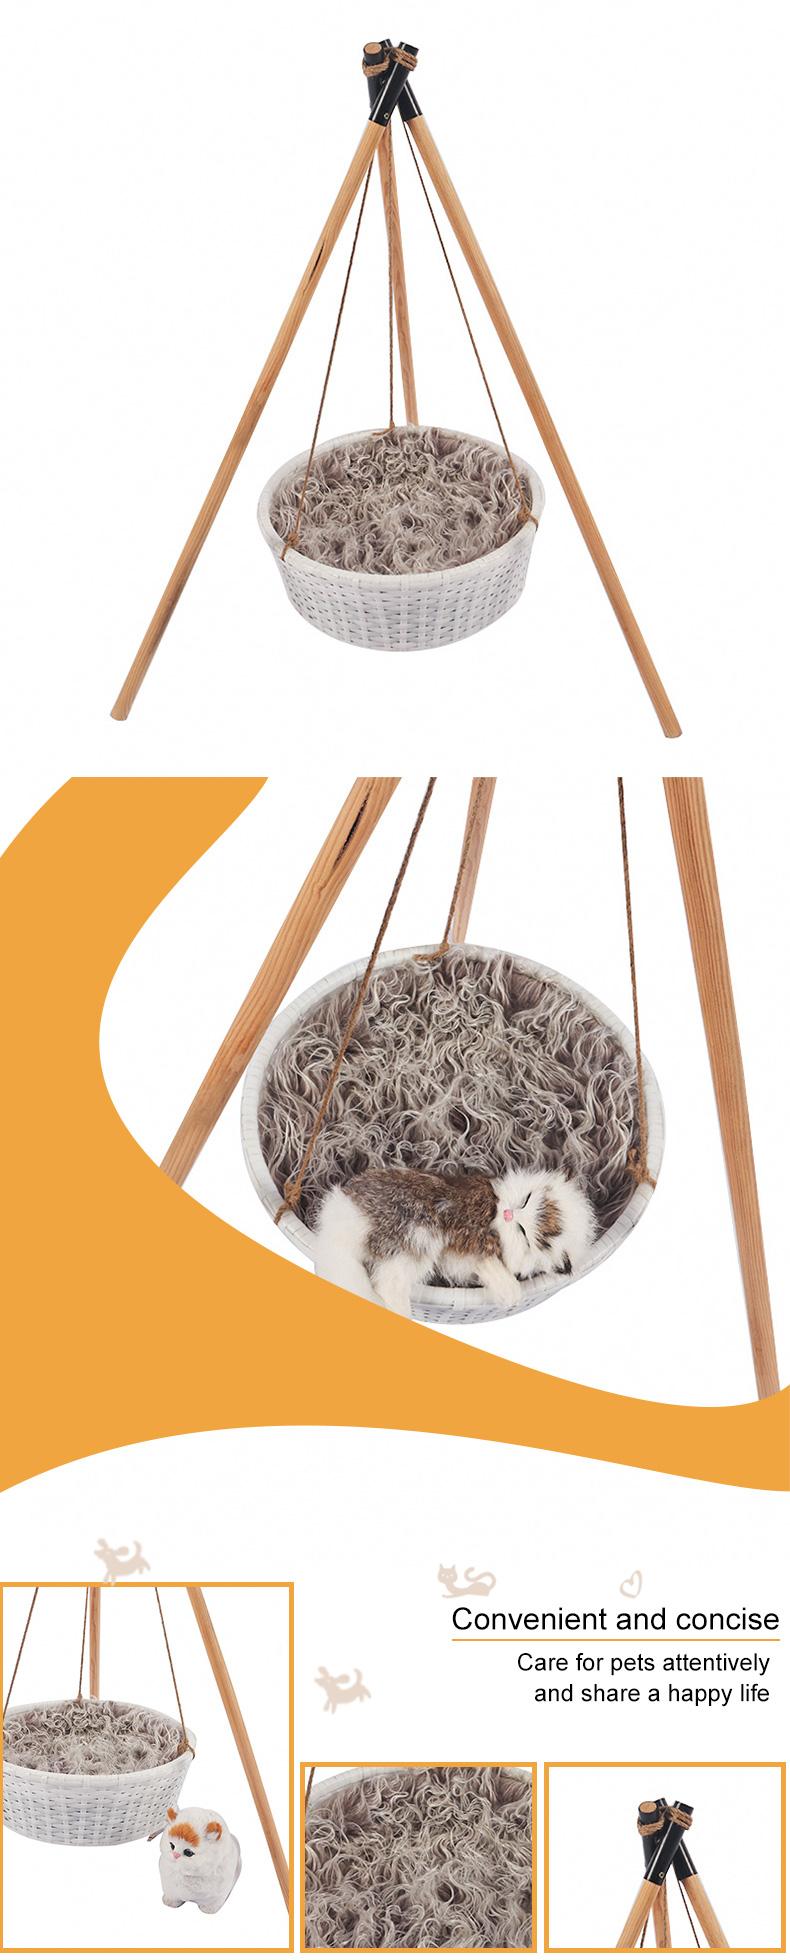 a tripod cat basket pet product